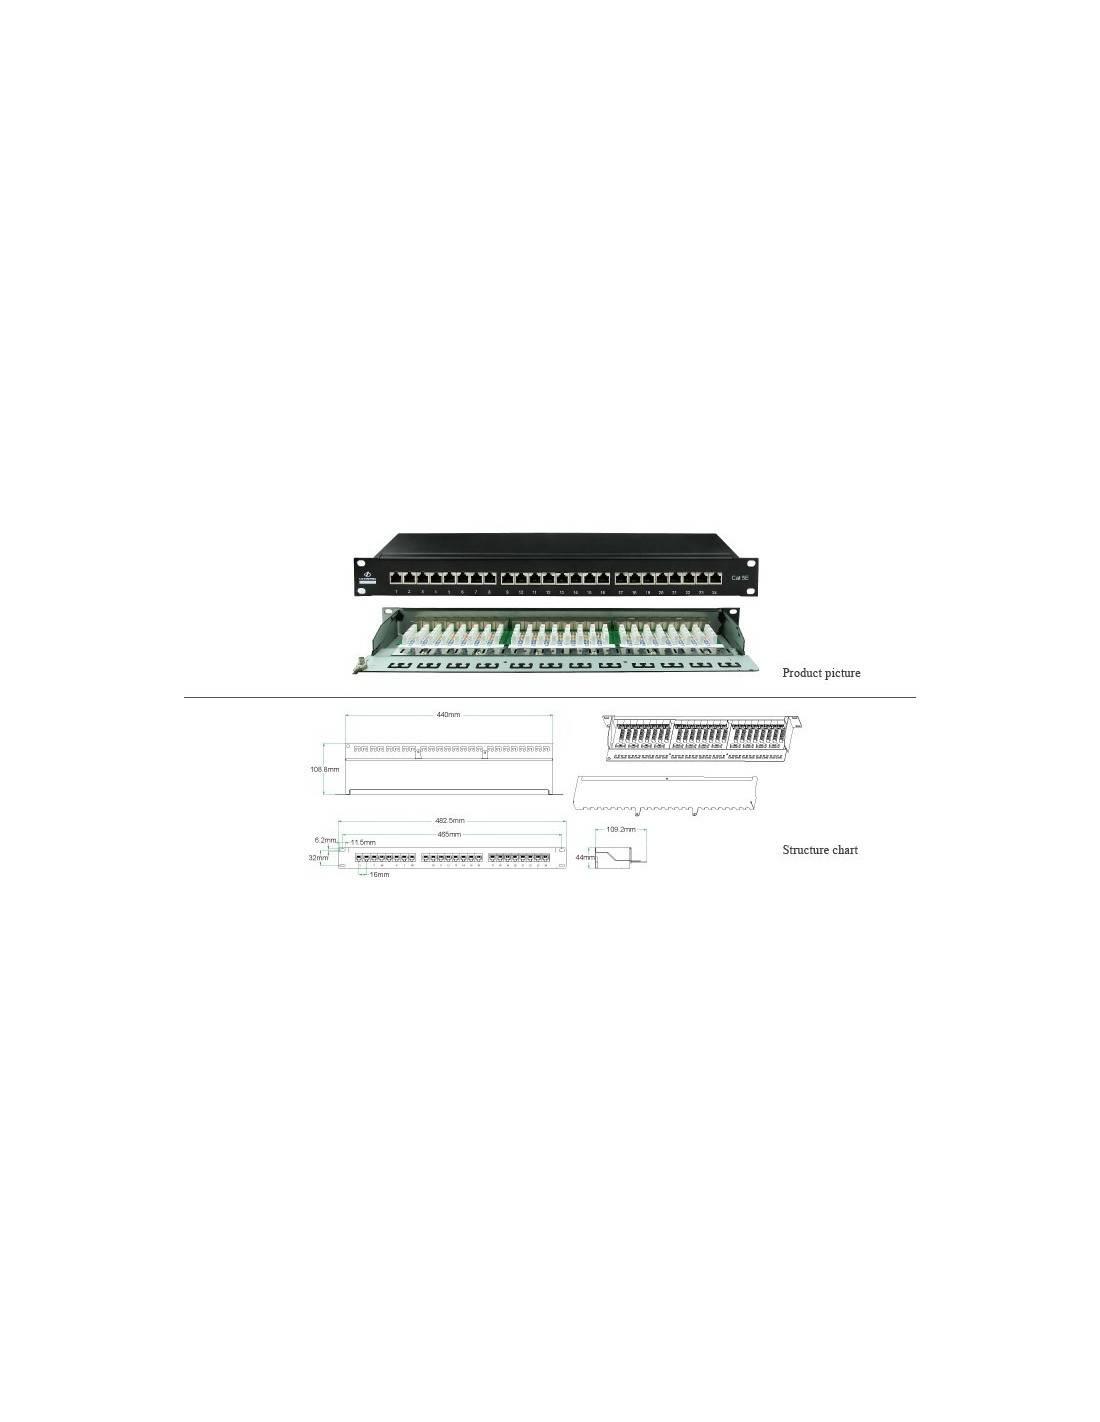 Cat 5E FTP 24-port patch panel, loaded